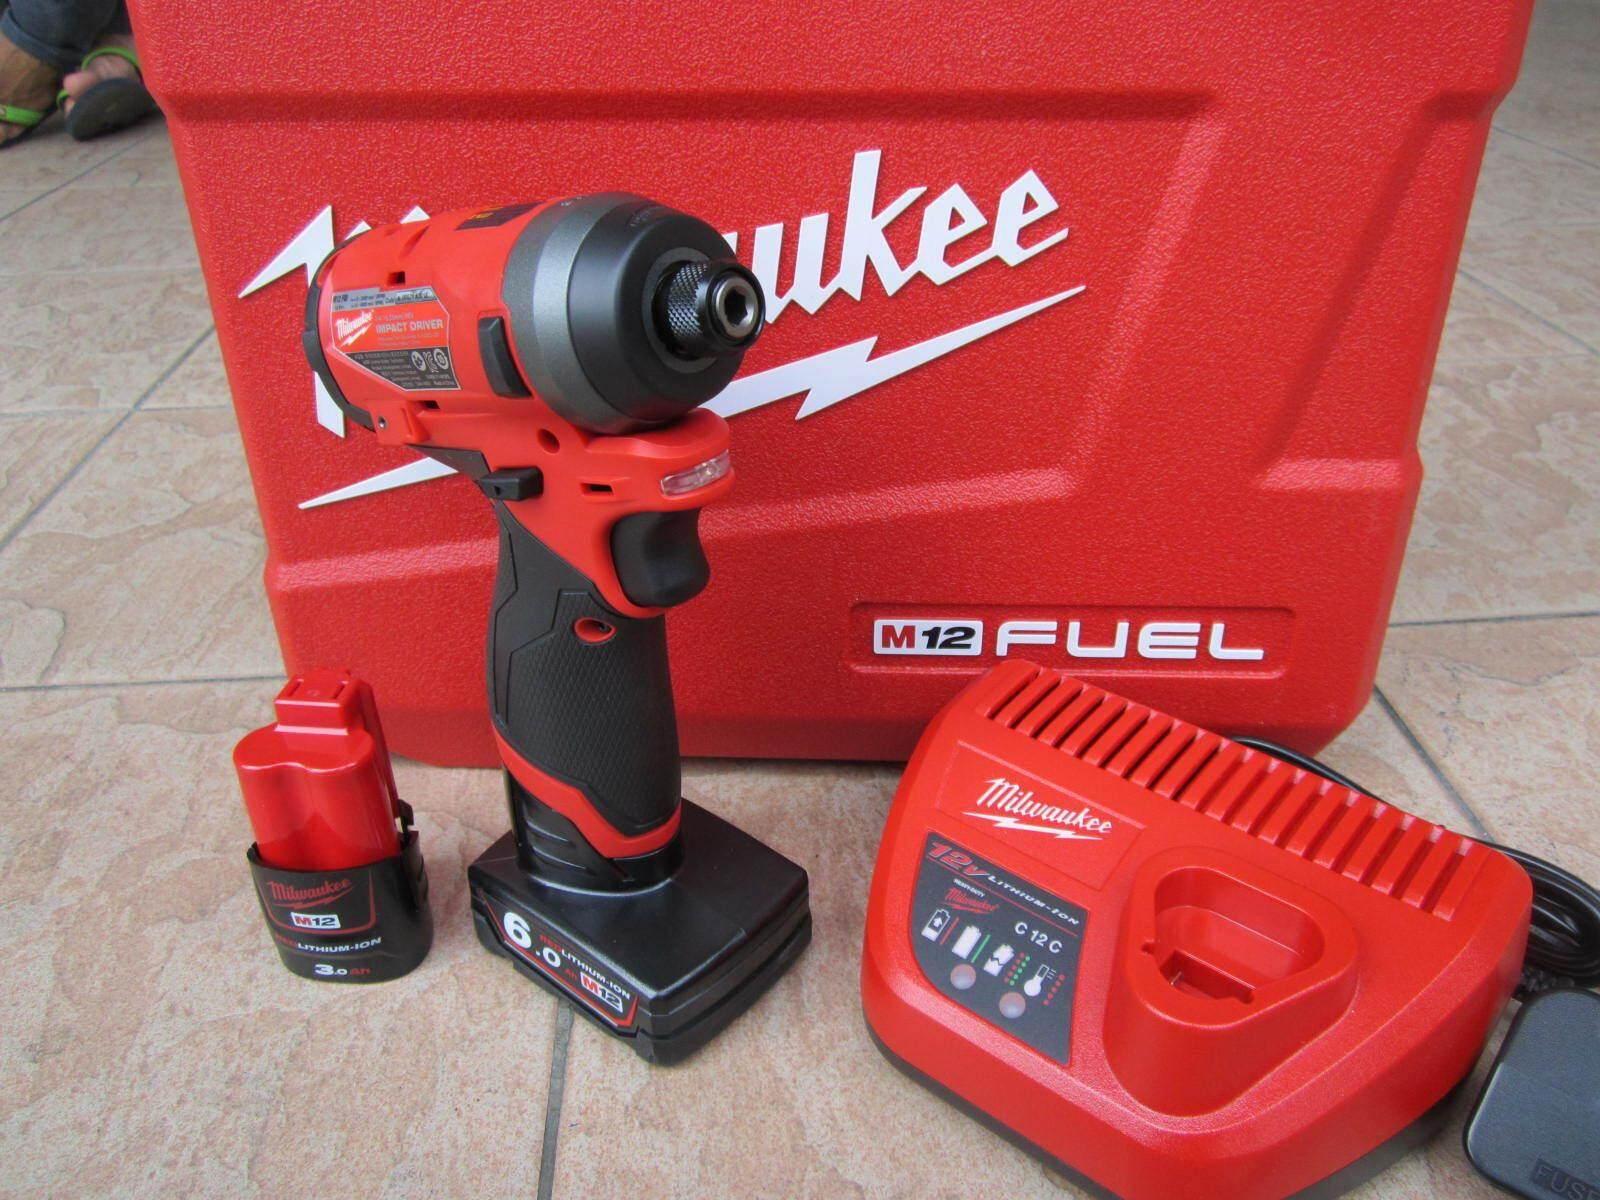 Milwaukee M12 FUEL Sub-Compact 1/4″ Hex Impact Driver, Impact Driver